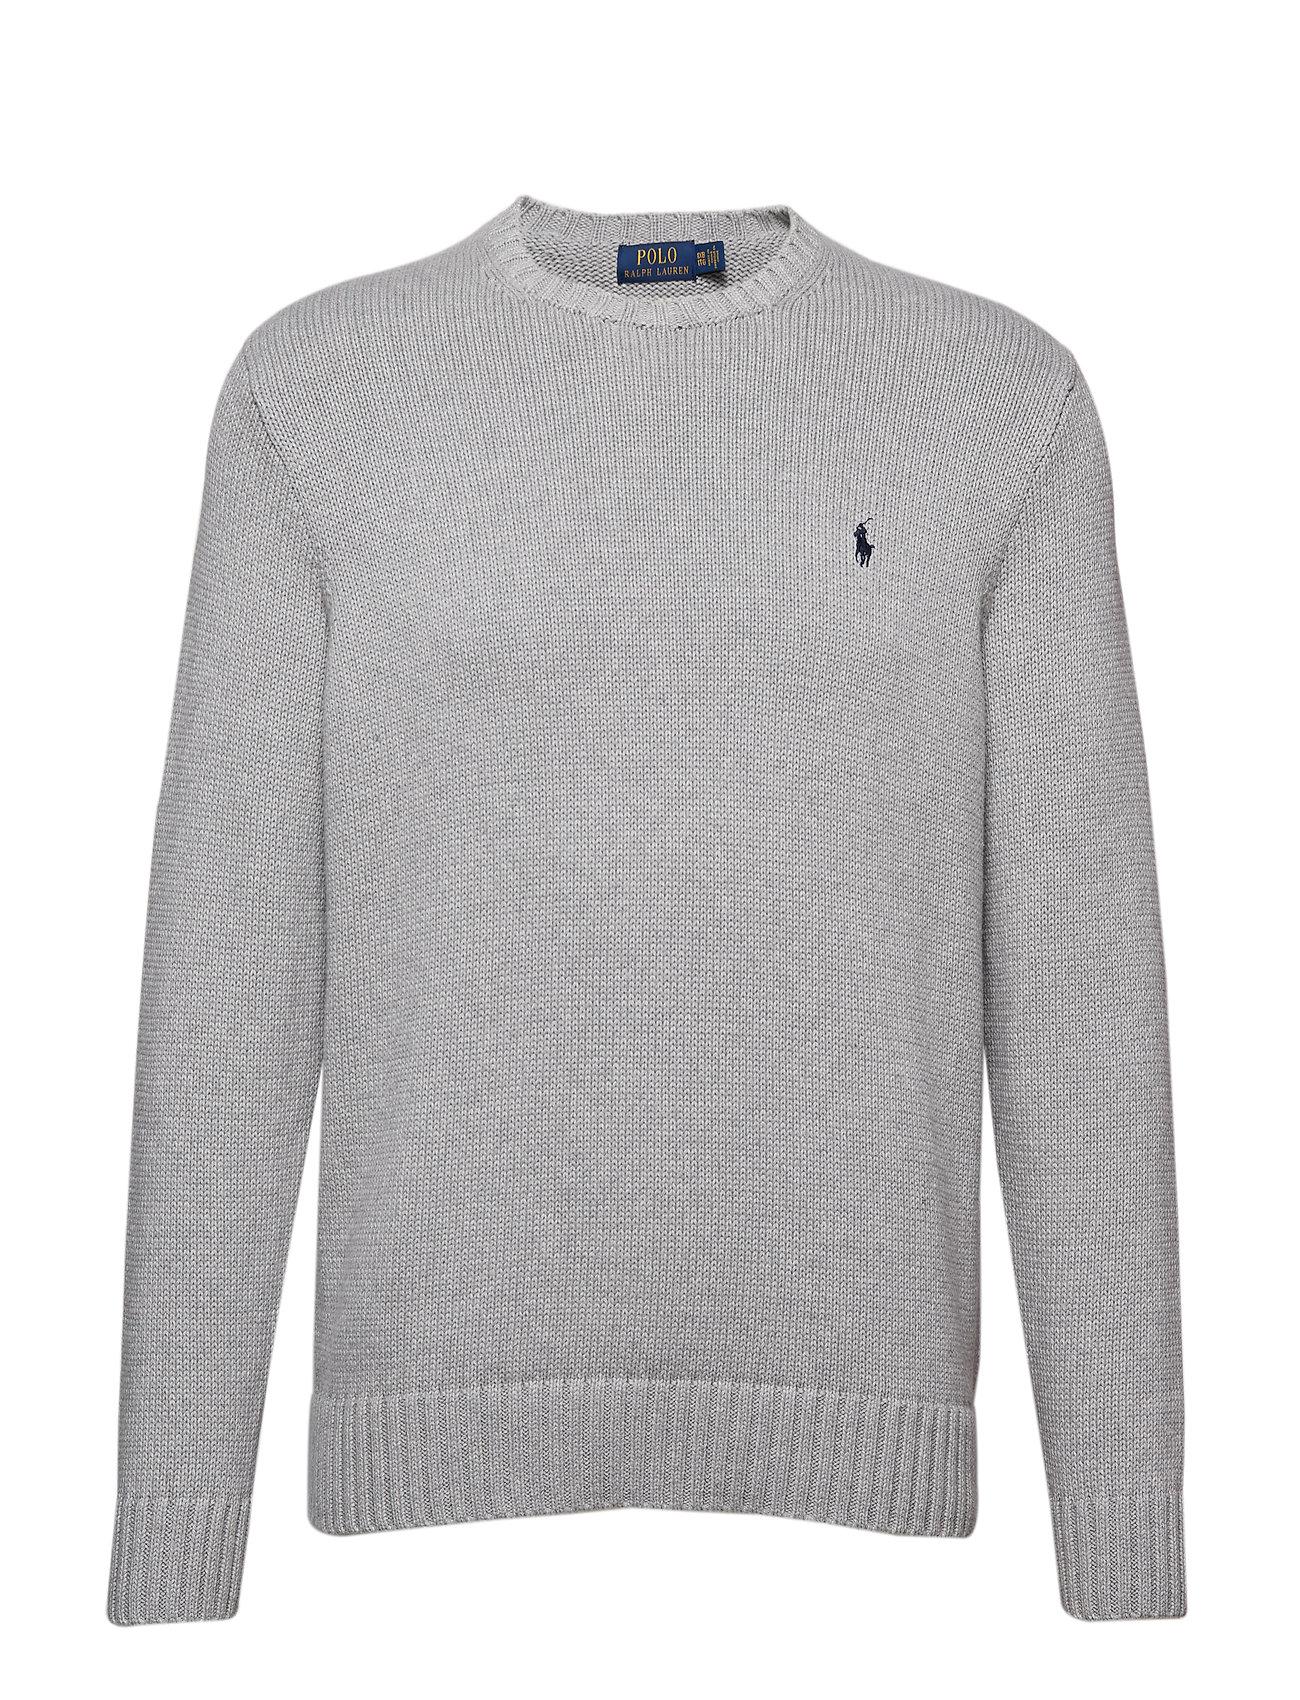 Polo Ralph Lauren Big & Tall Cotton Crewneck Sweater - ANDOVER GREY HEAT